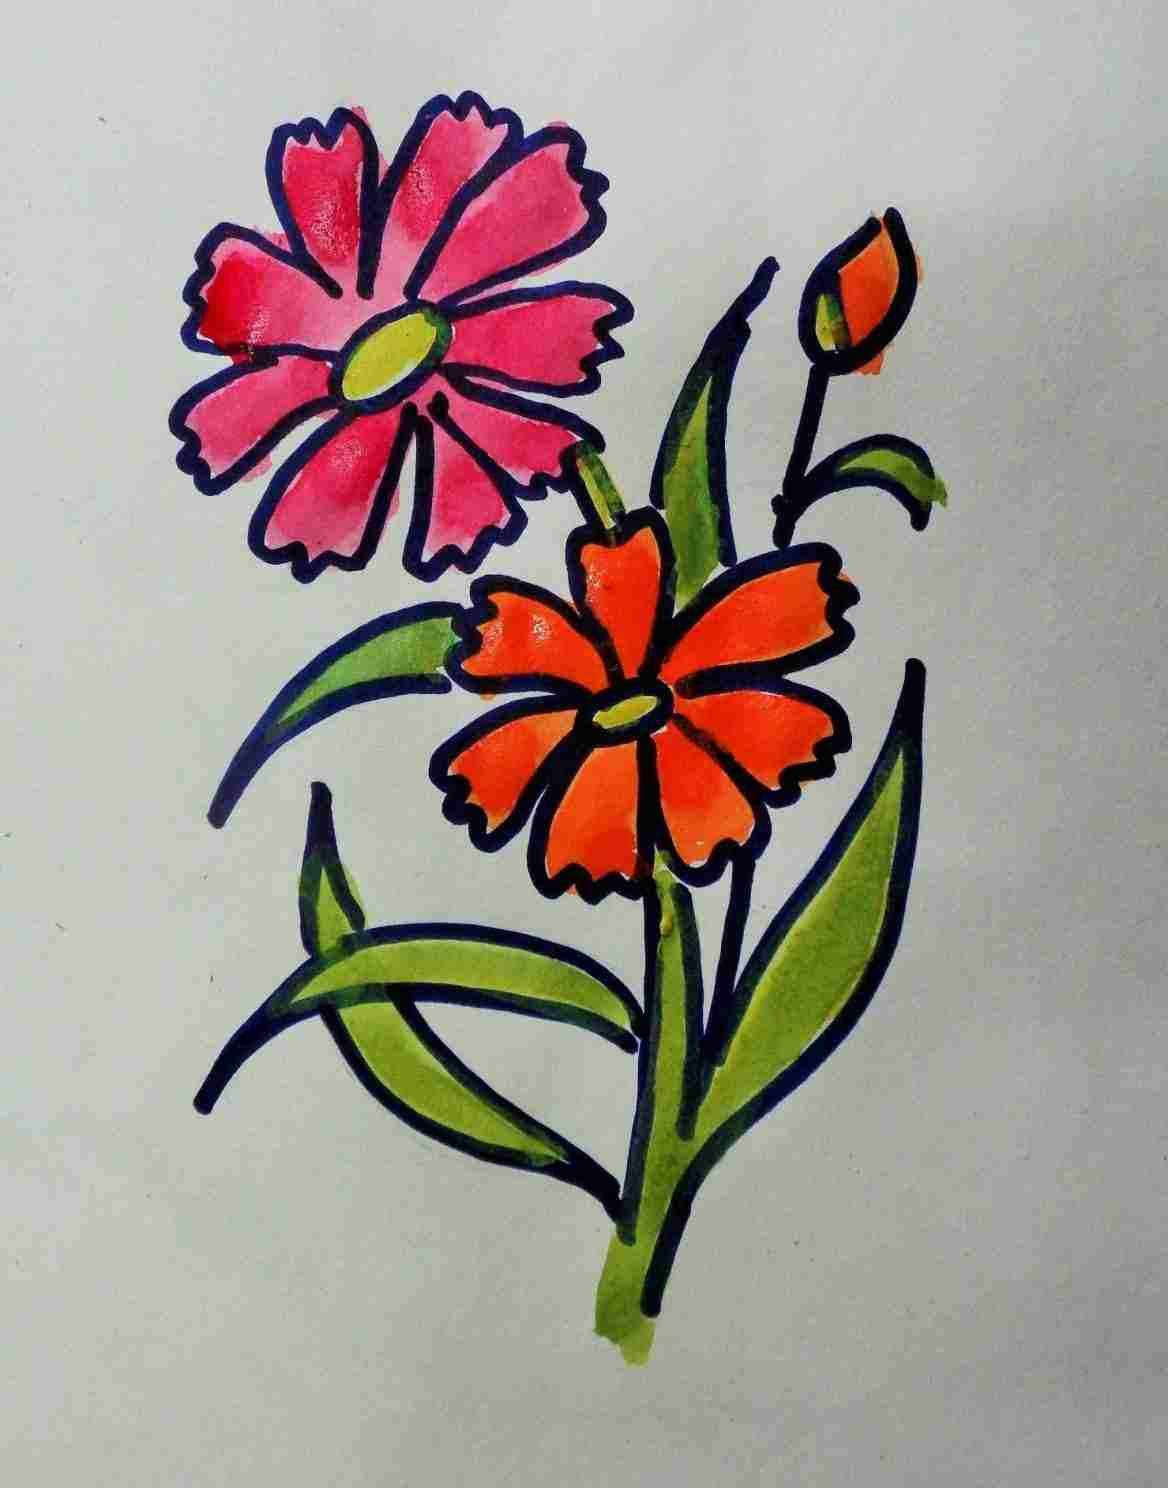 1168x1488 flower drawing sakura paint artsrhideascom sakura flower drawing